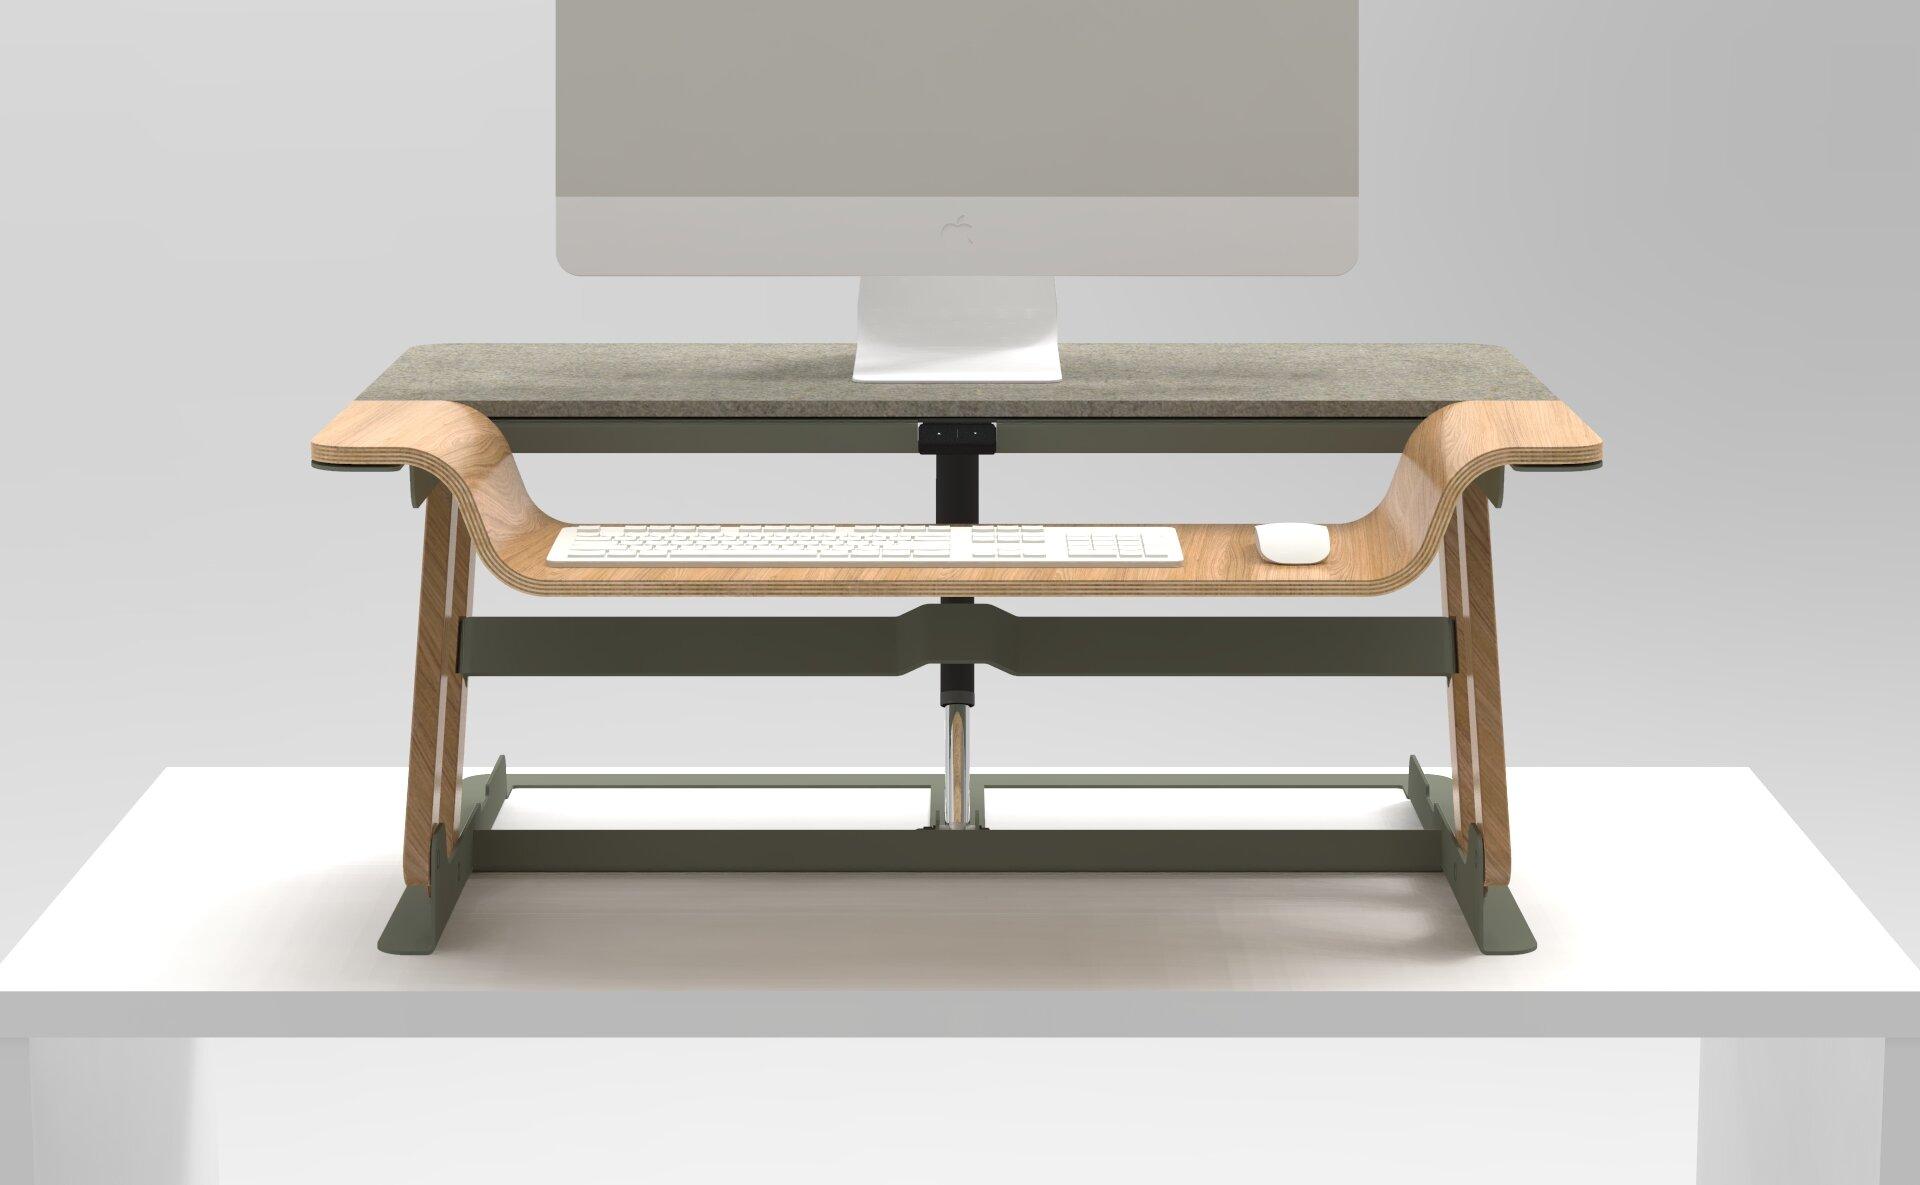 Artisan Desk Adaptor Projects Presentation Isometric View